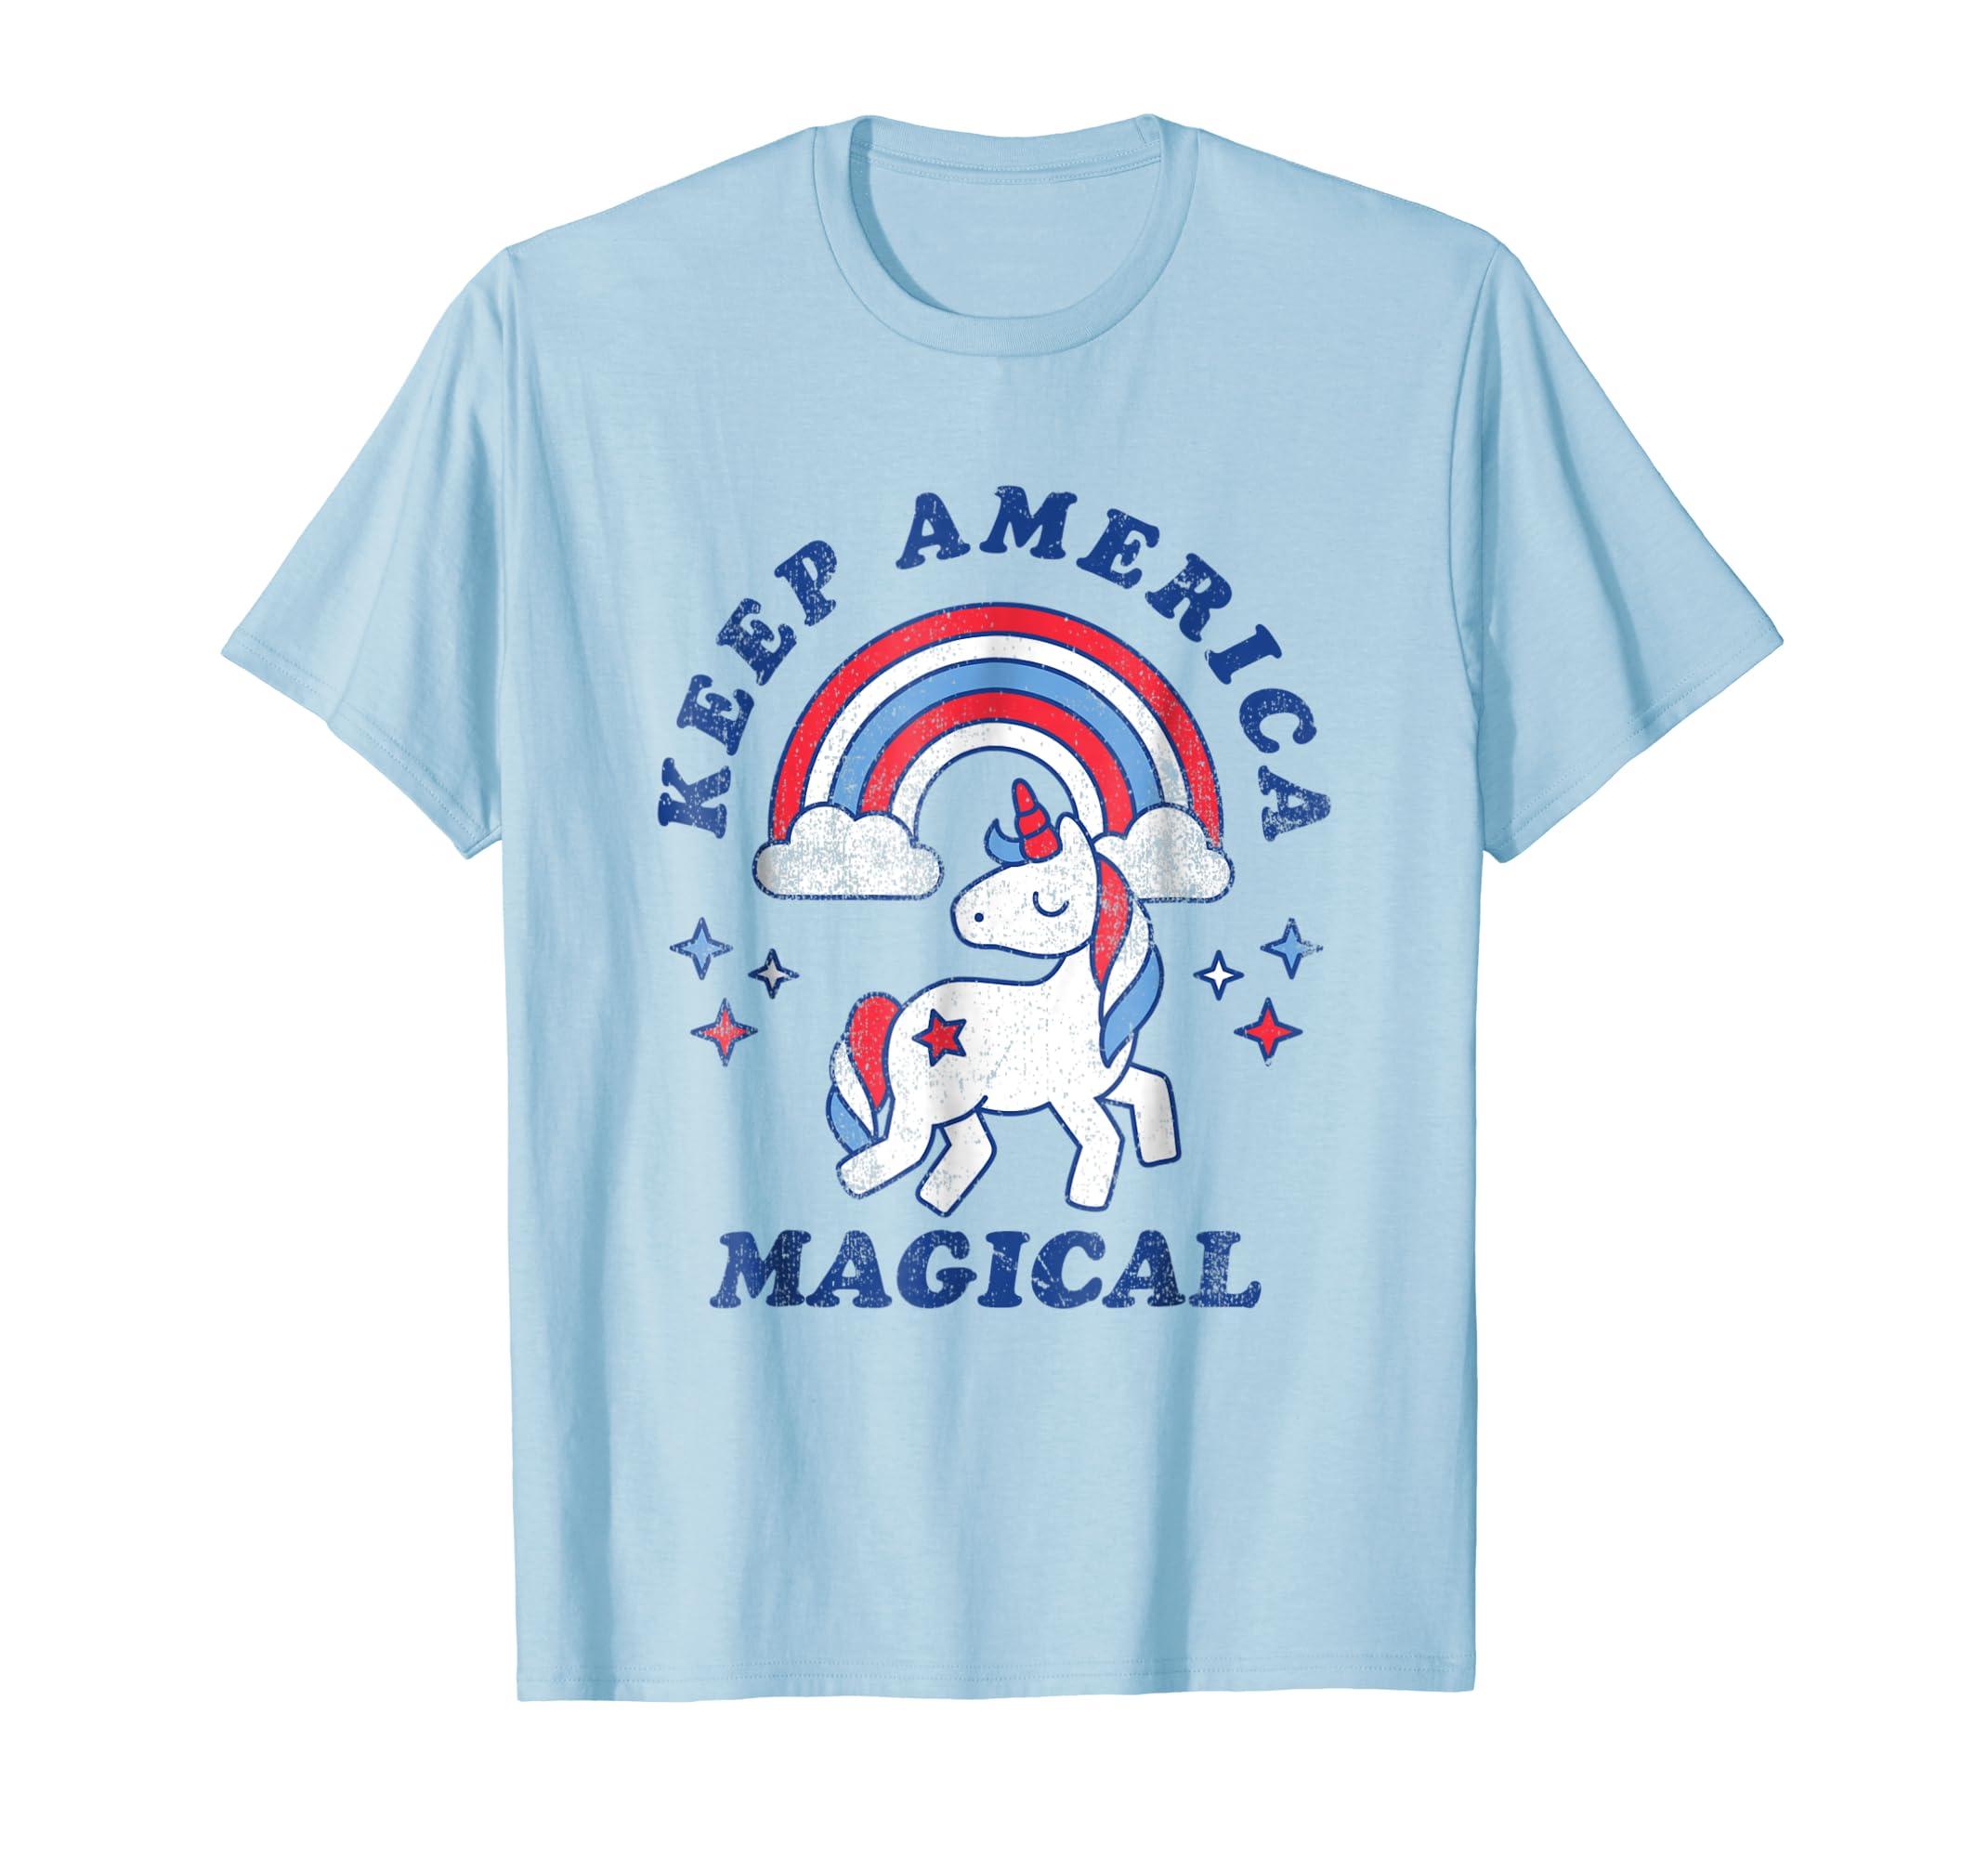 Amazon.com: Keep America Magical Unicorn Shirt - 4th of July T-Shirt ...